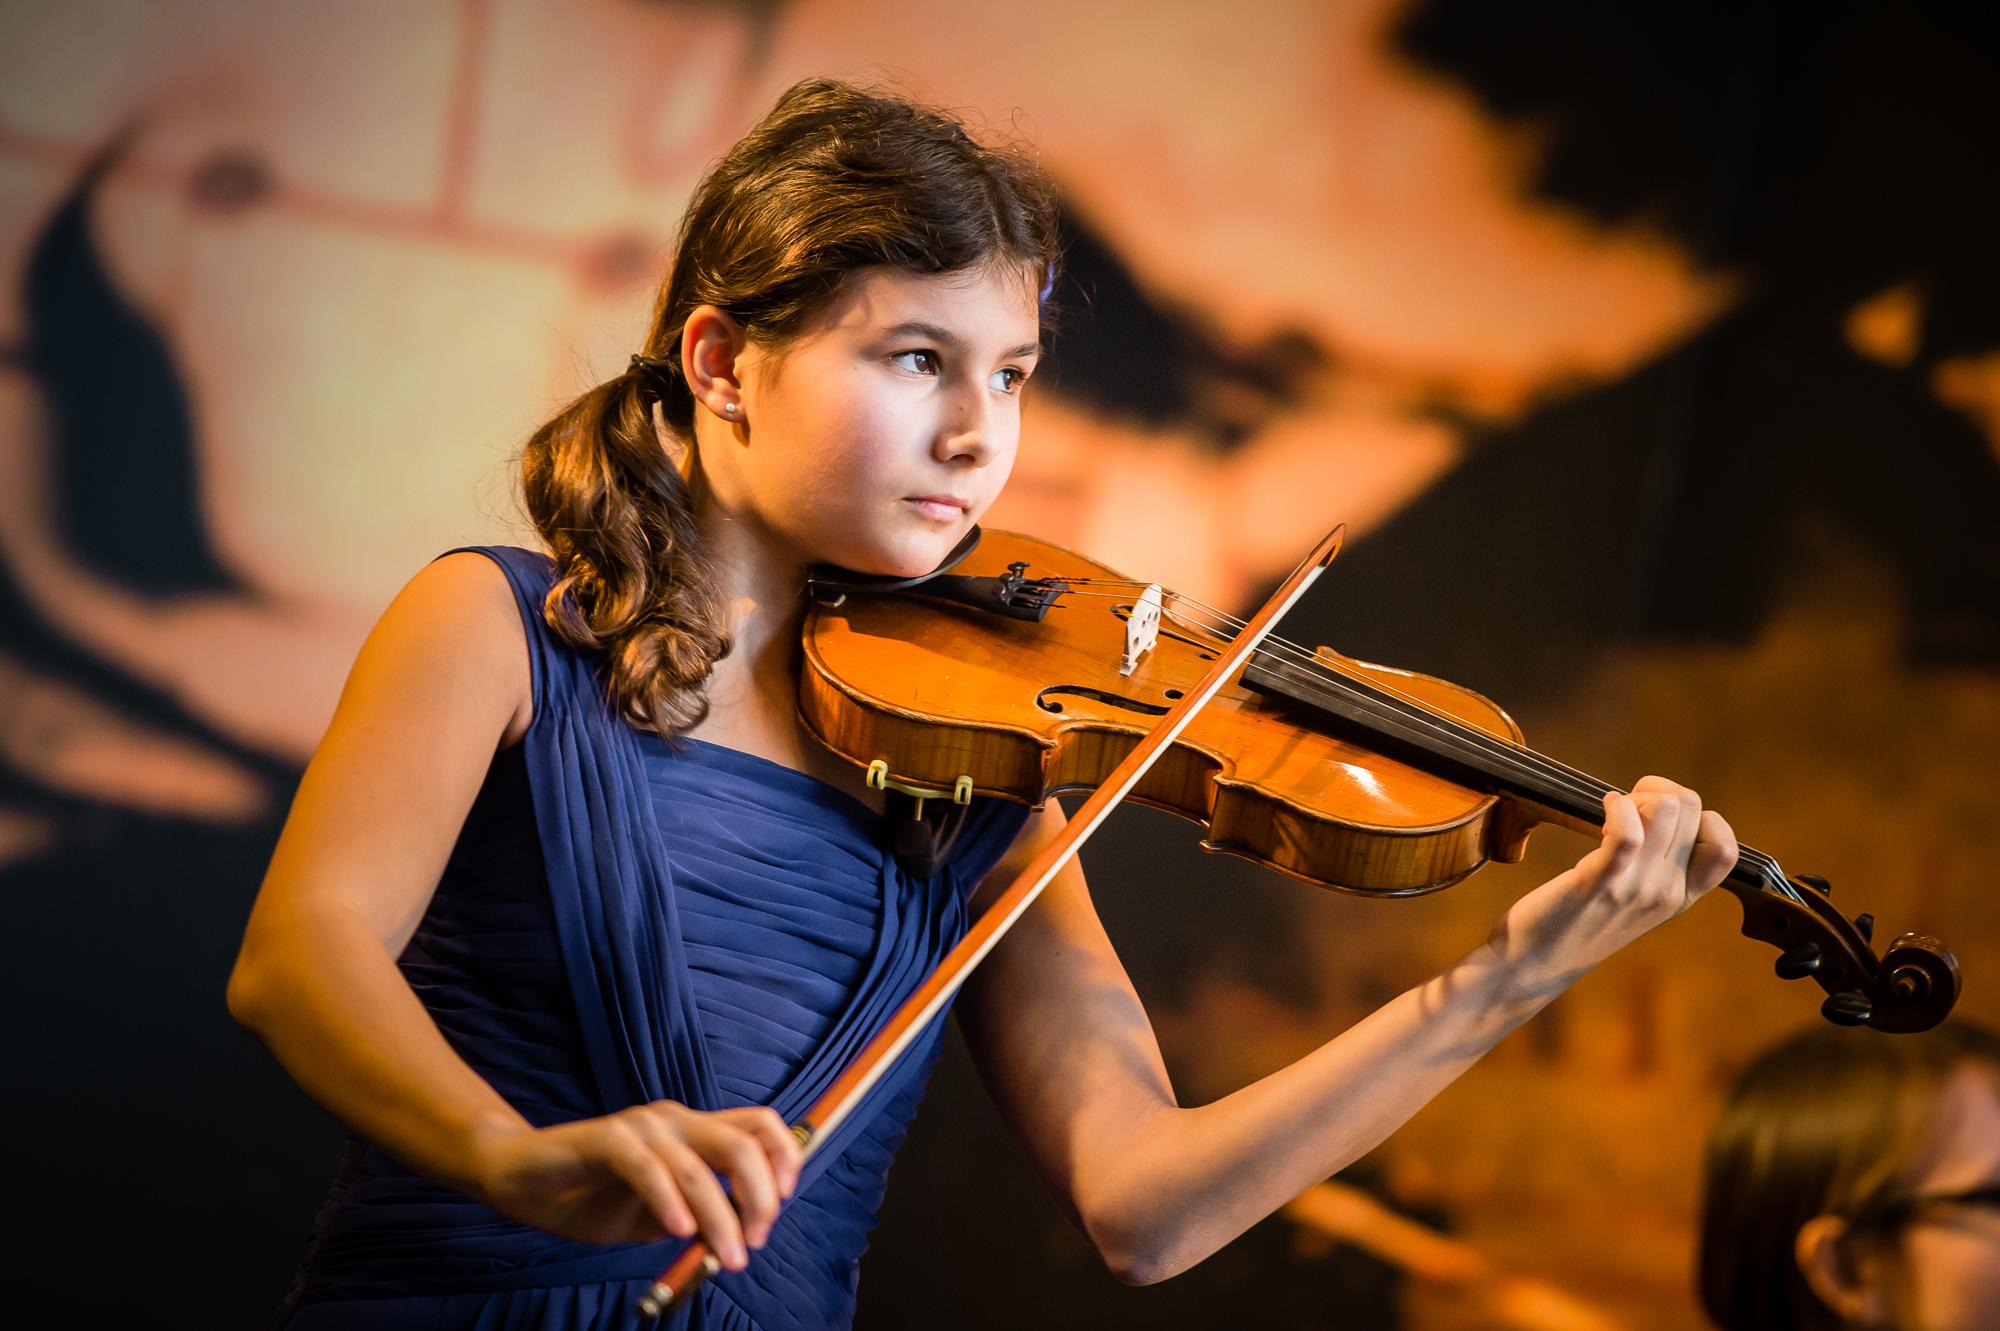 Iris van Nuland speelt in Joods Kindermuseum